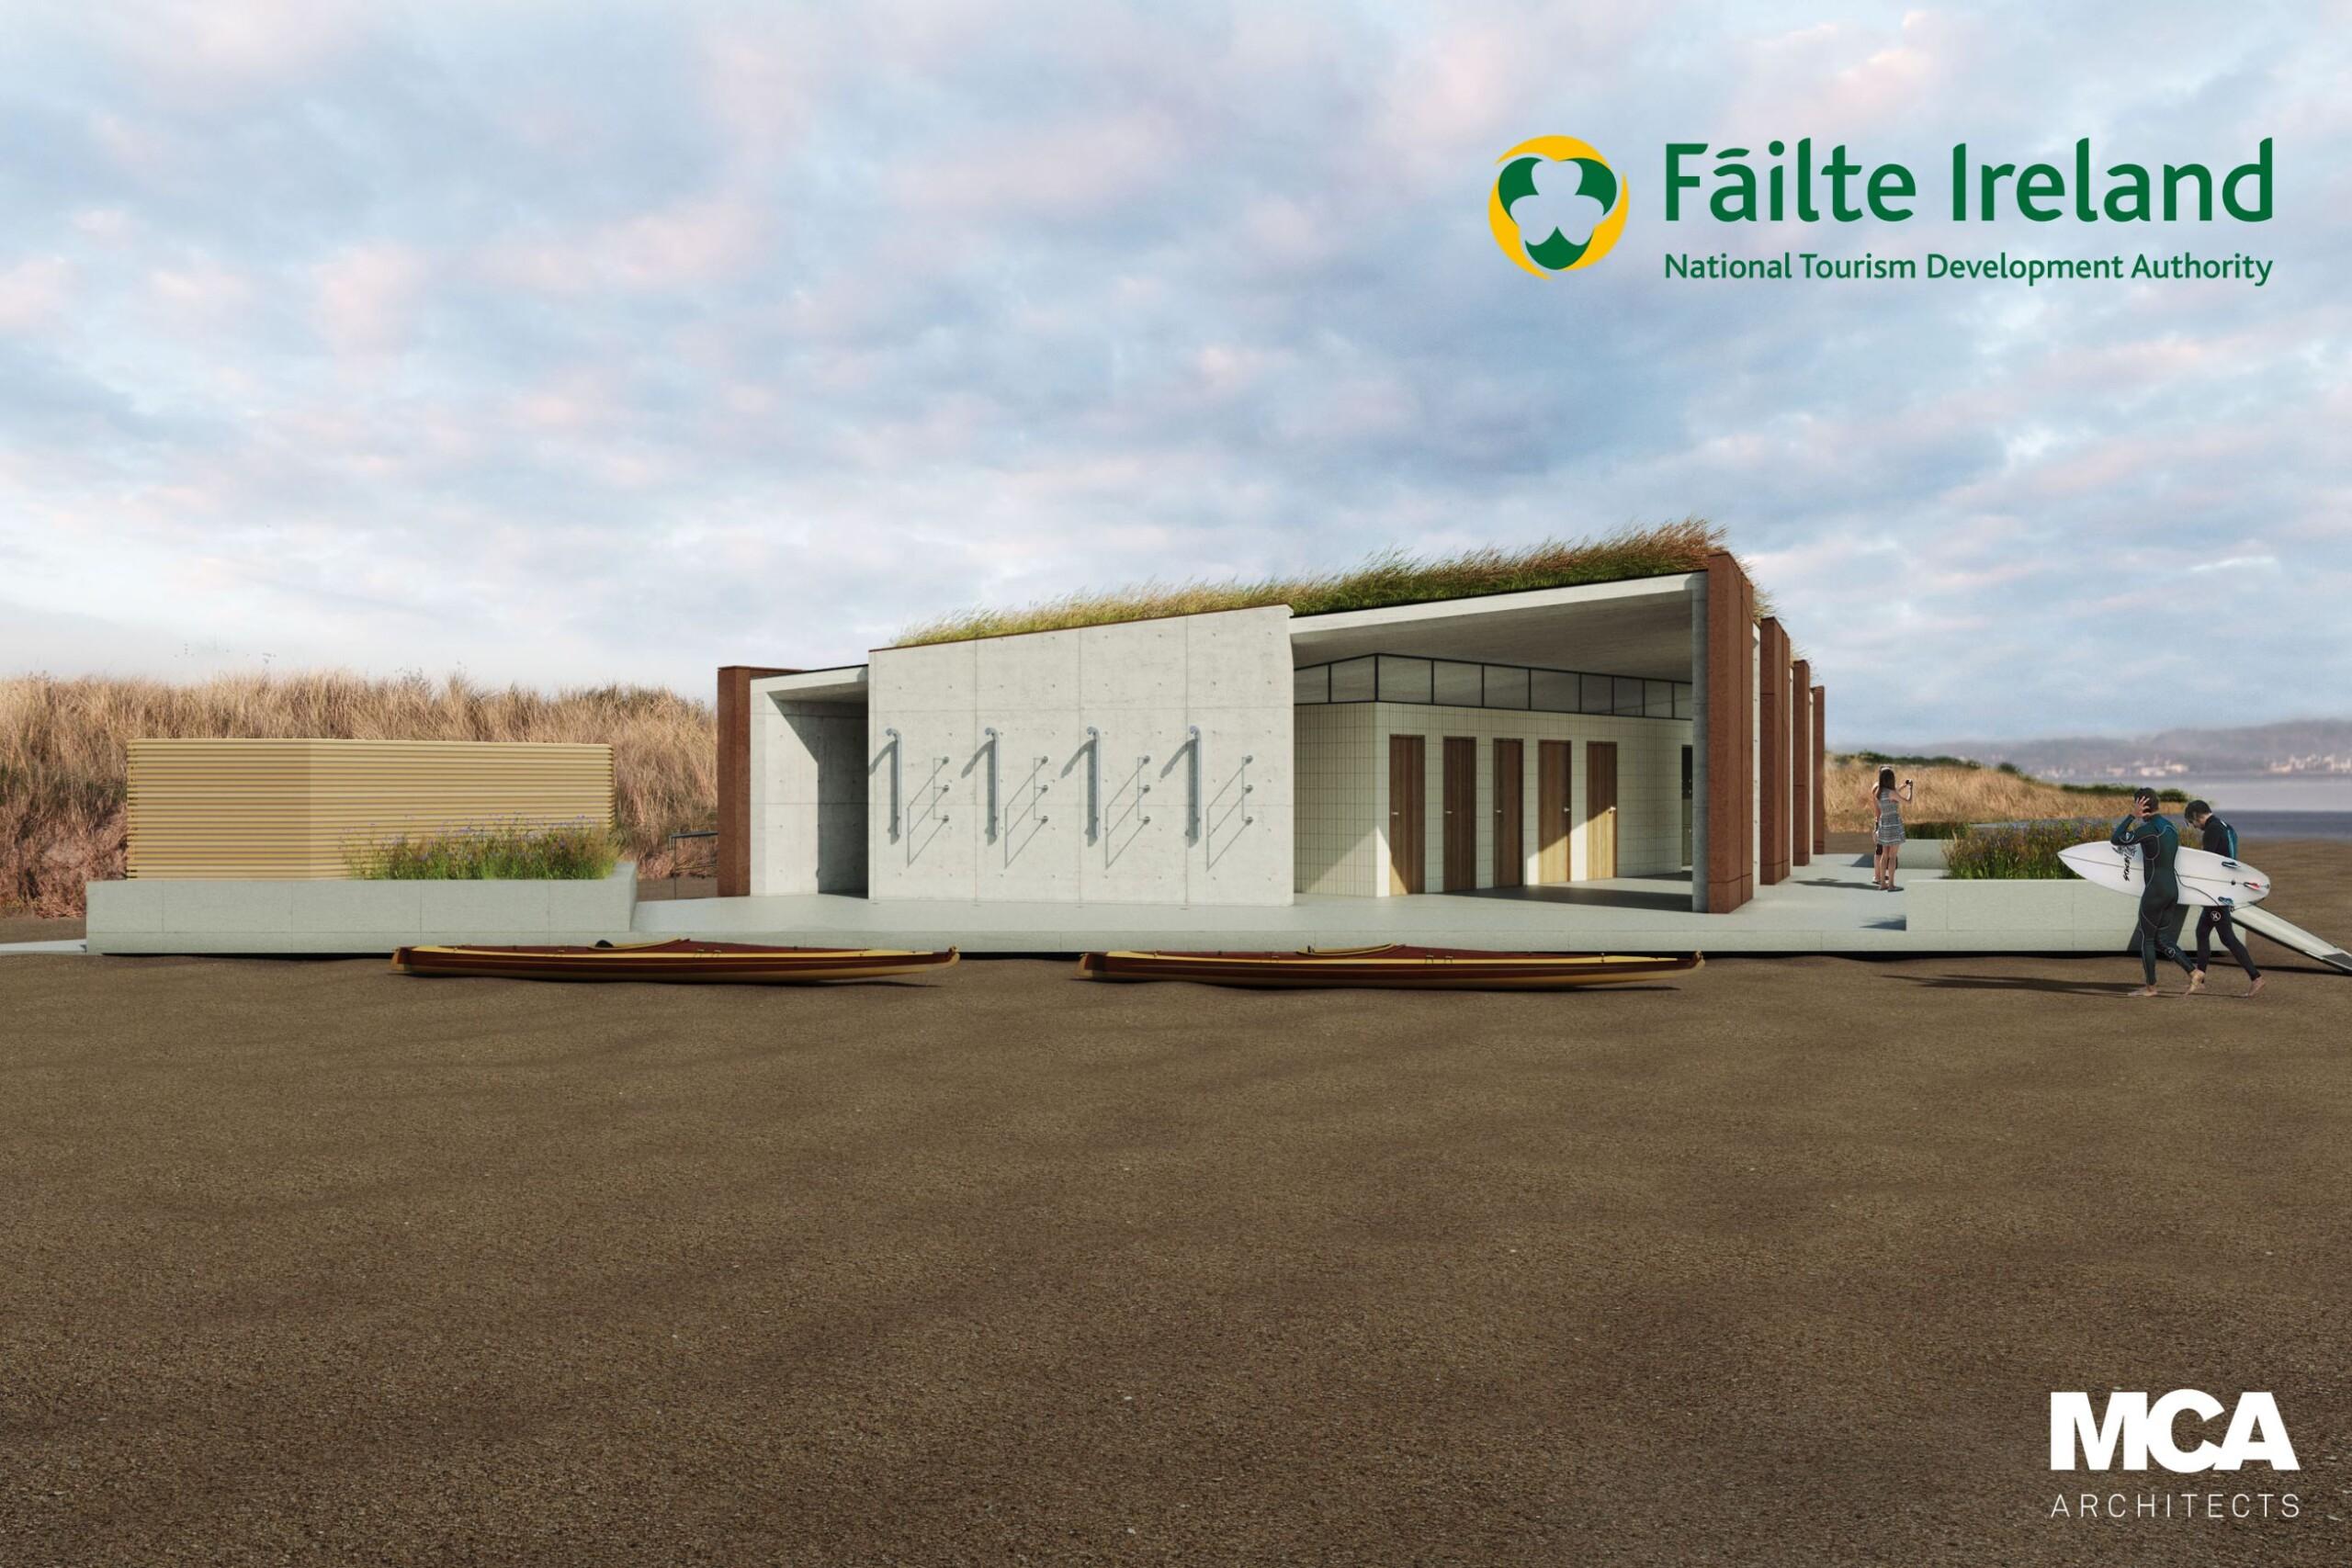 artist rendering of failte ireland facility - platforms for growth bundoran